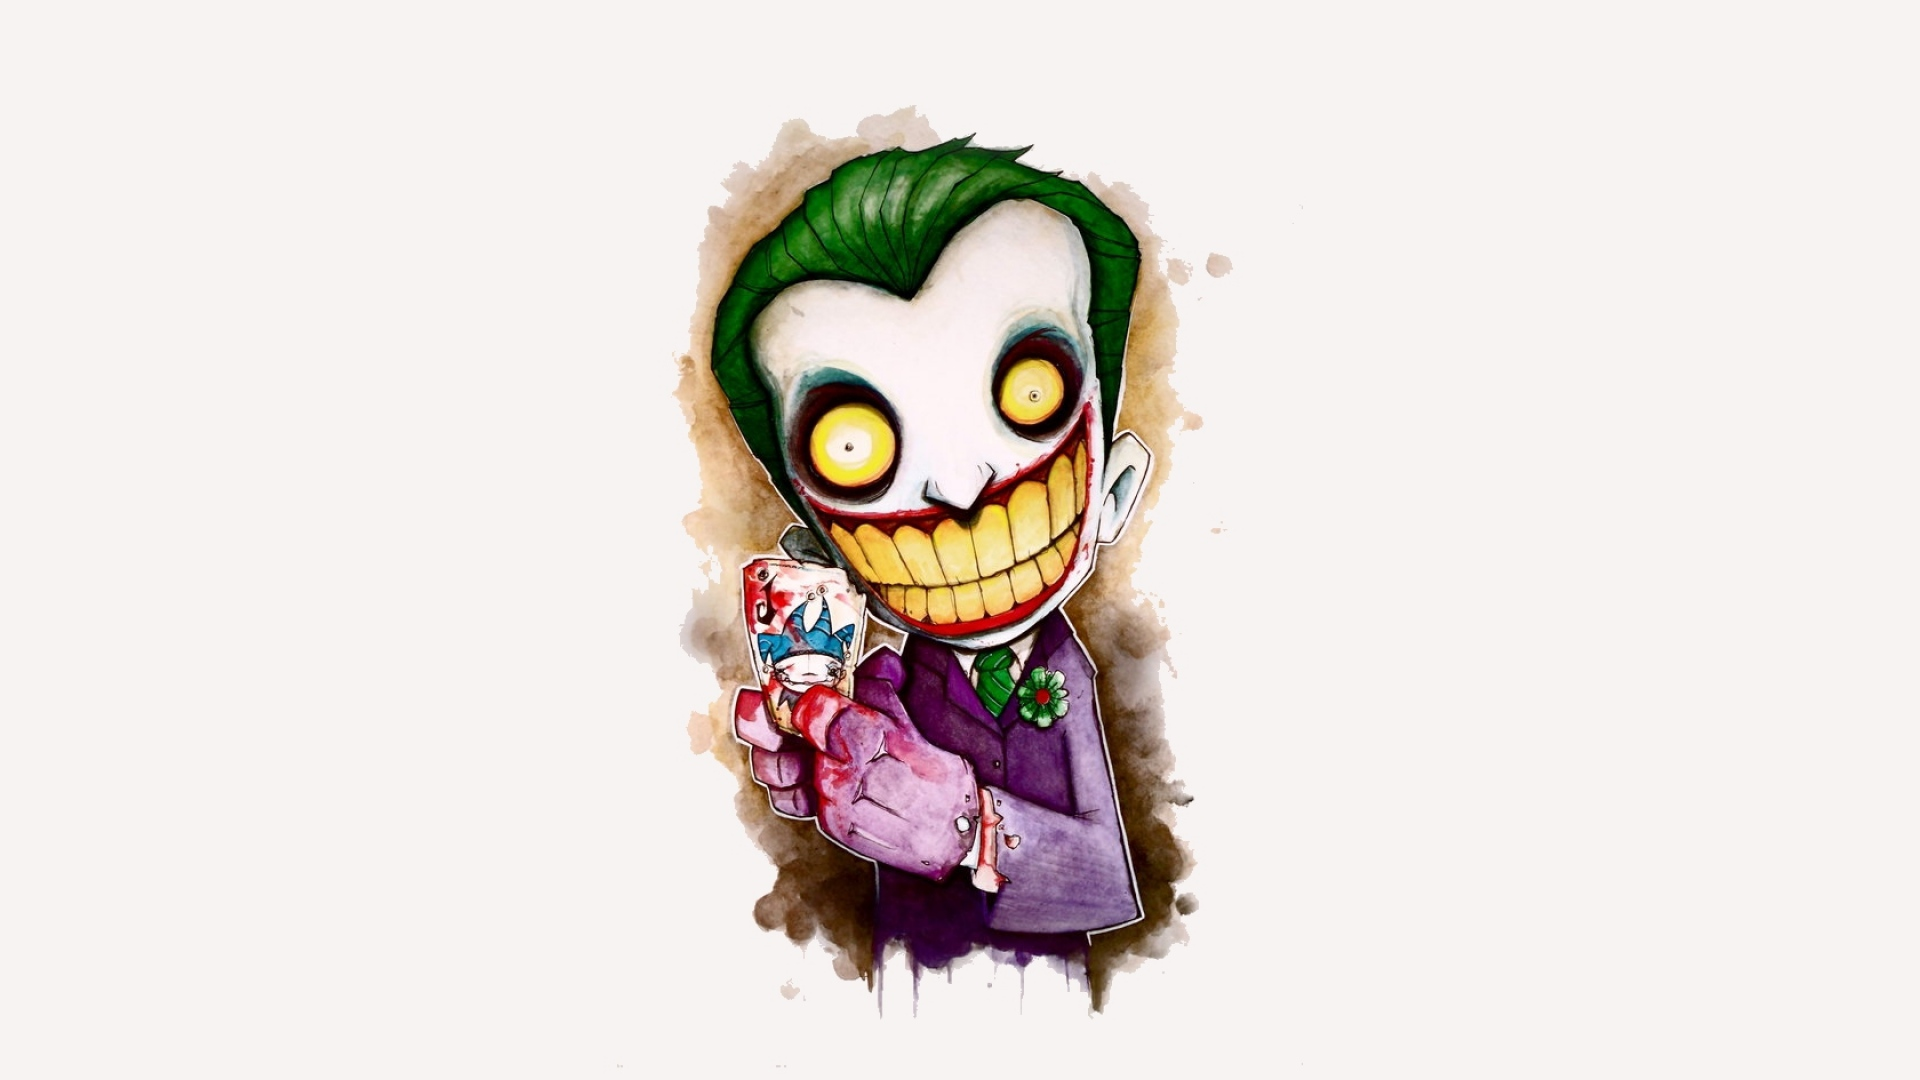 Full HD 1080p Joker Wallpapers HD, Desktop Backgrounds 1920x1080